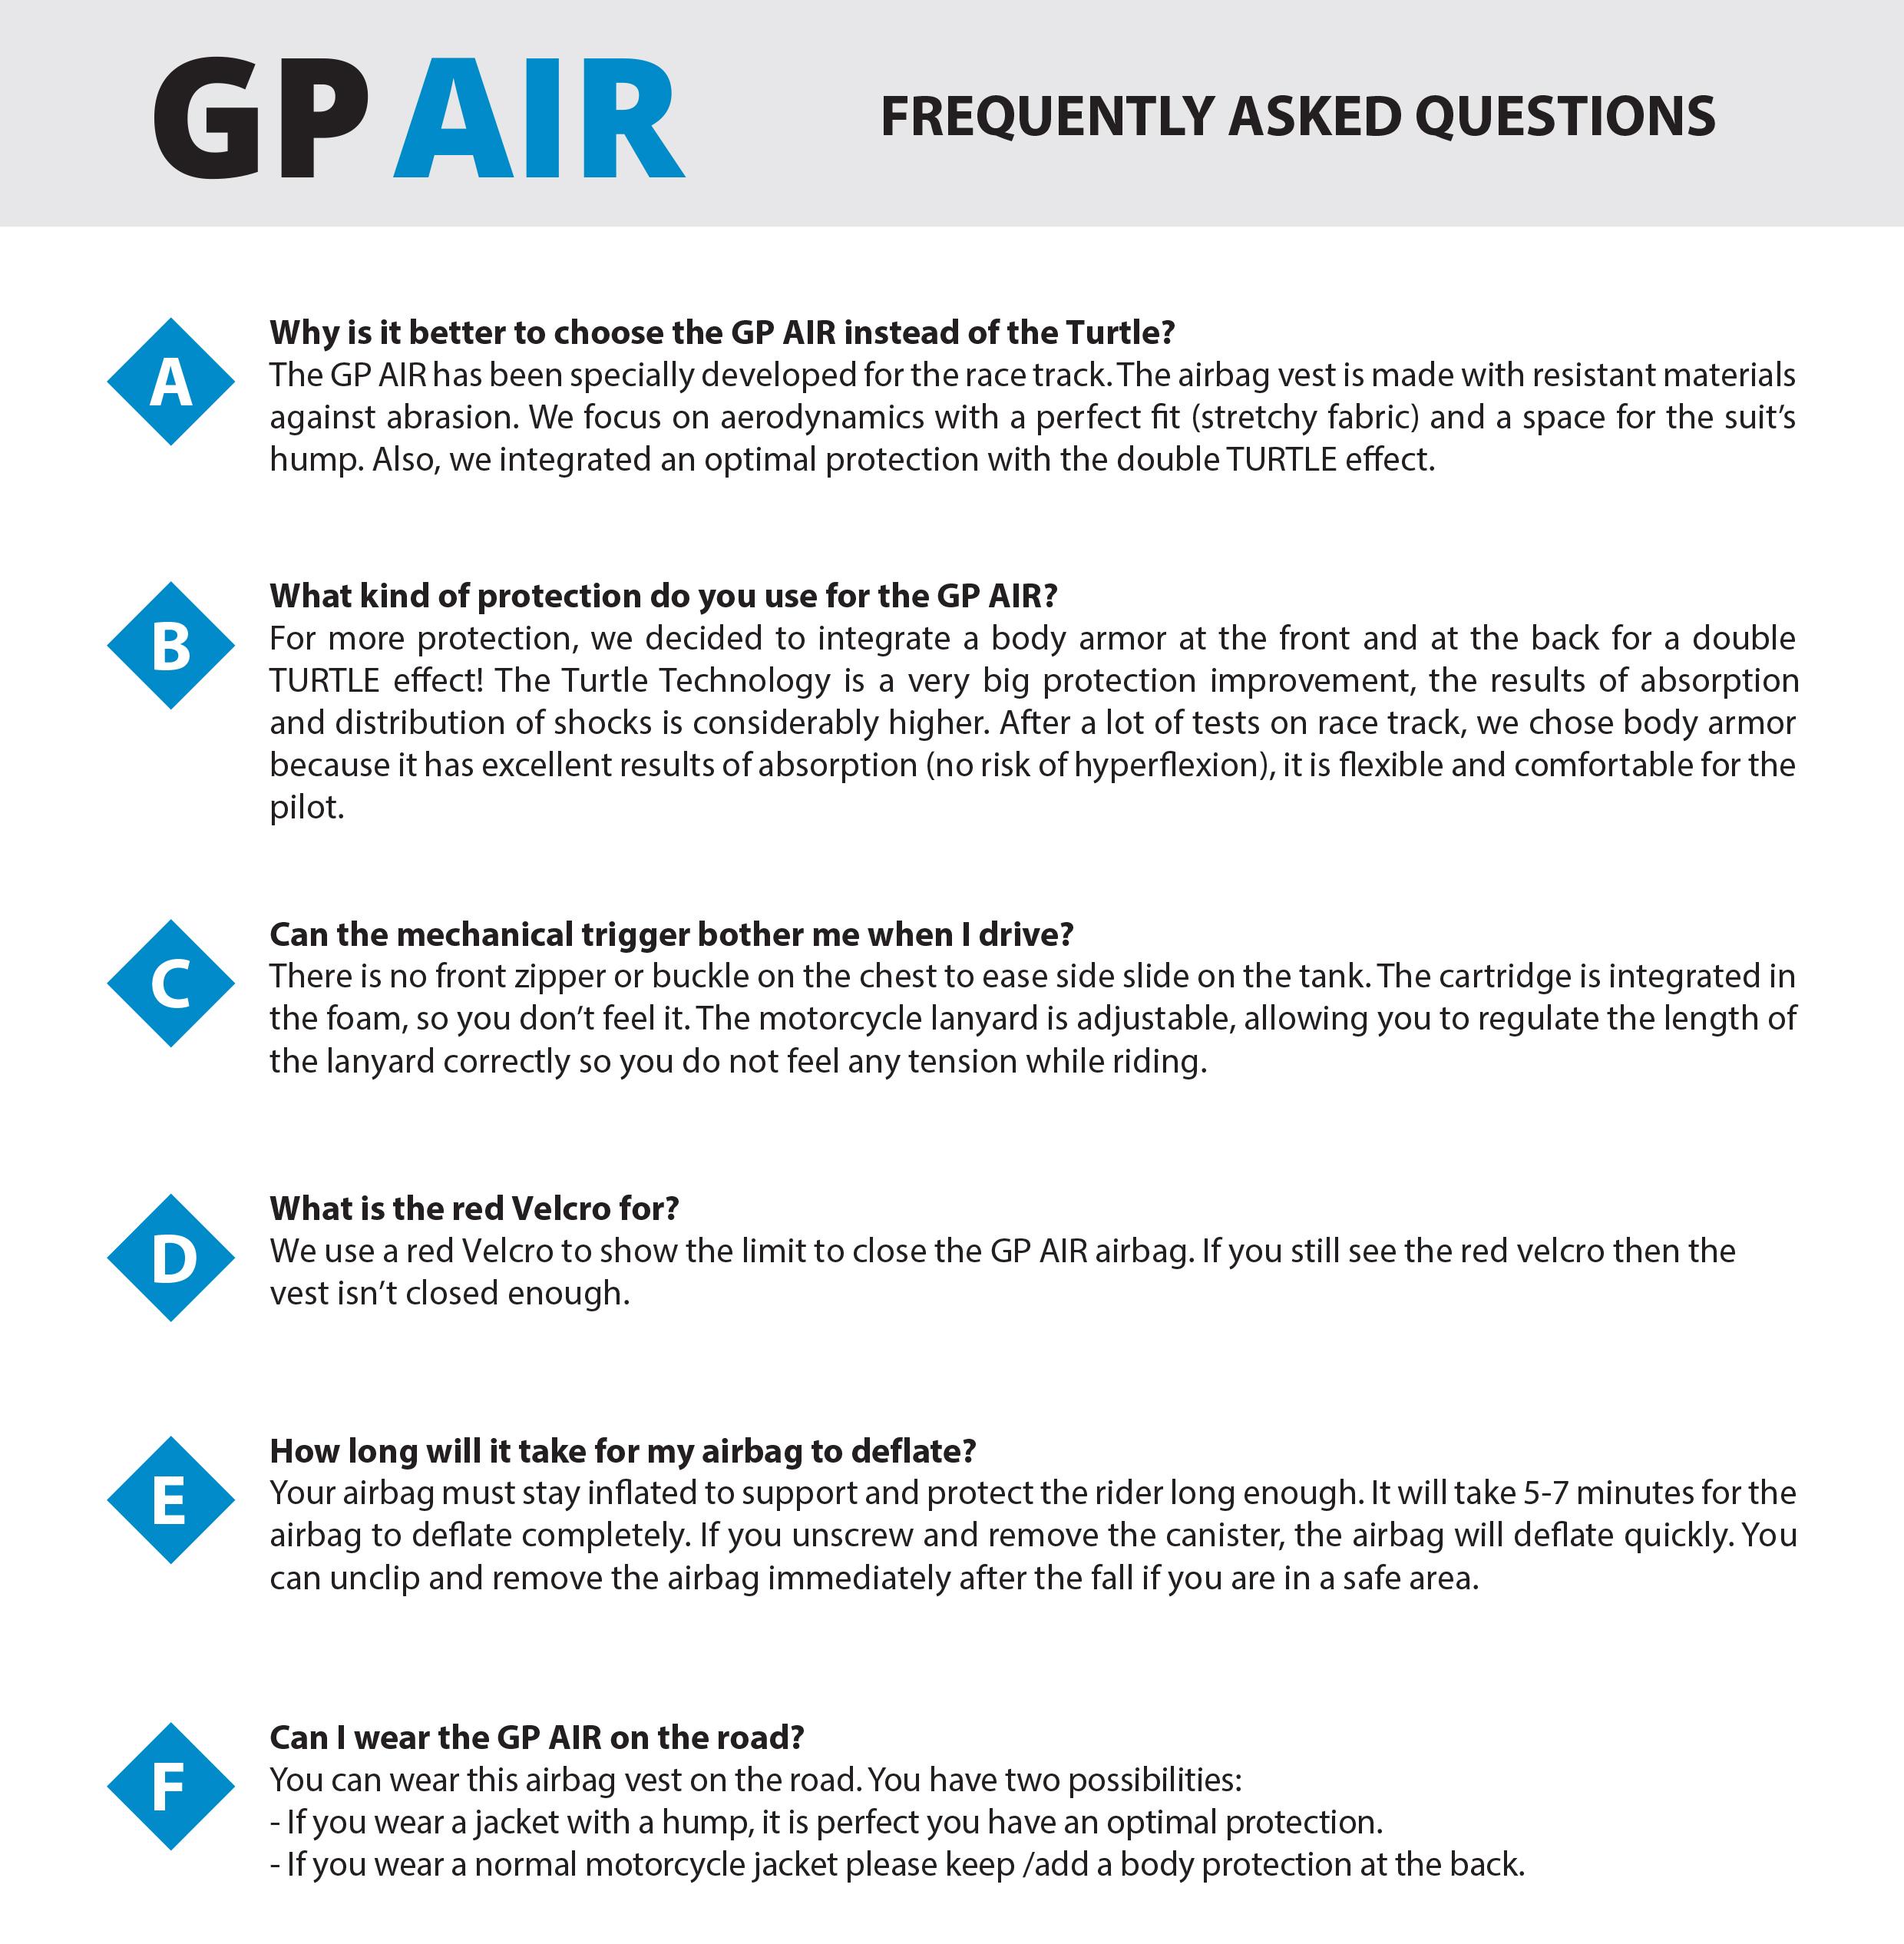 newsletter-gp-air-2018-en-faq.jpg